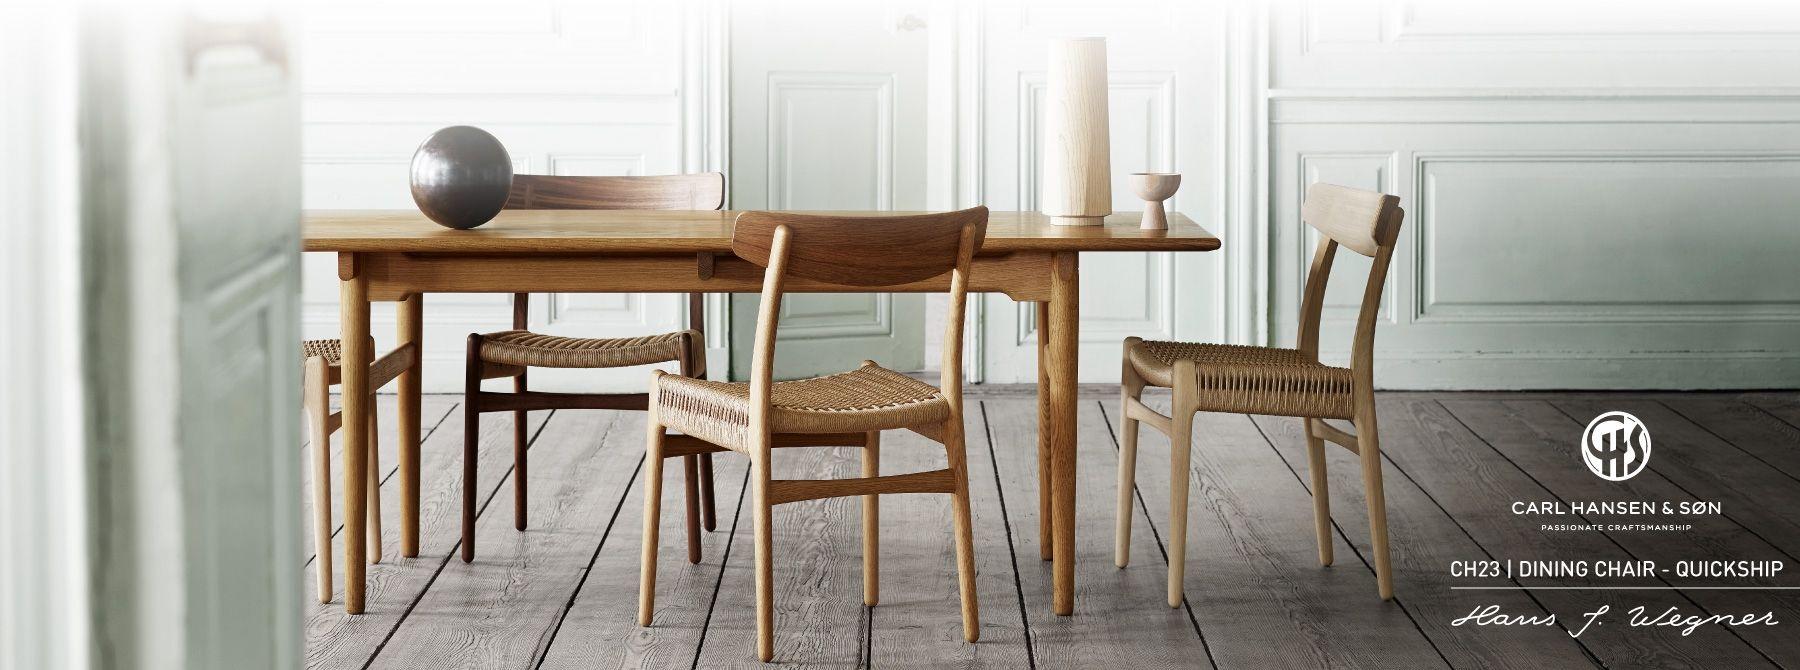 Fjorn The Best In Scandinavian Design High Quality Furniture